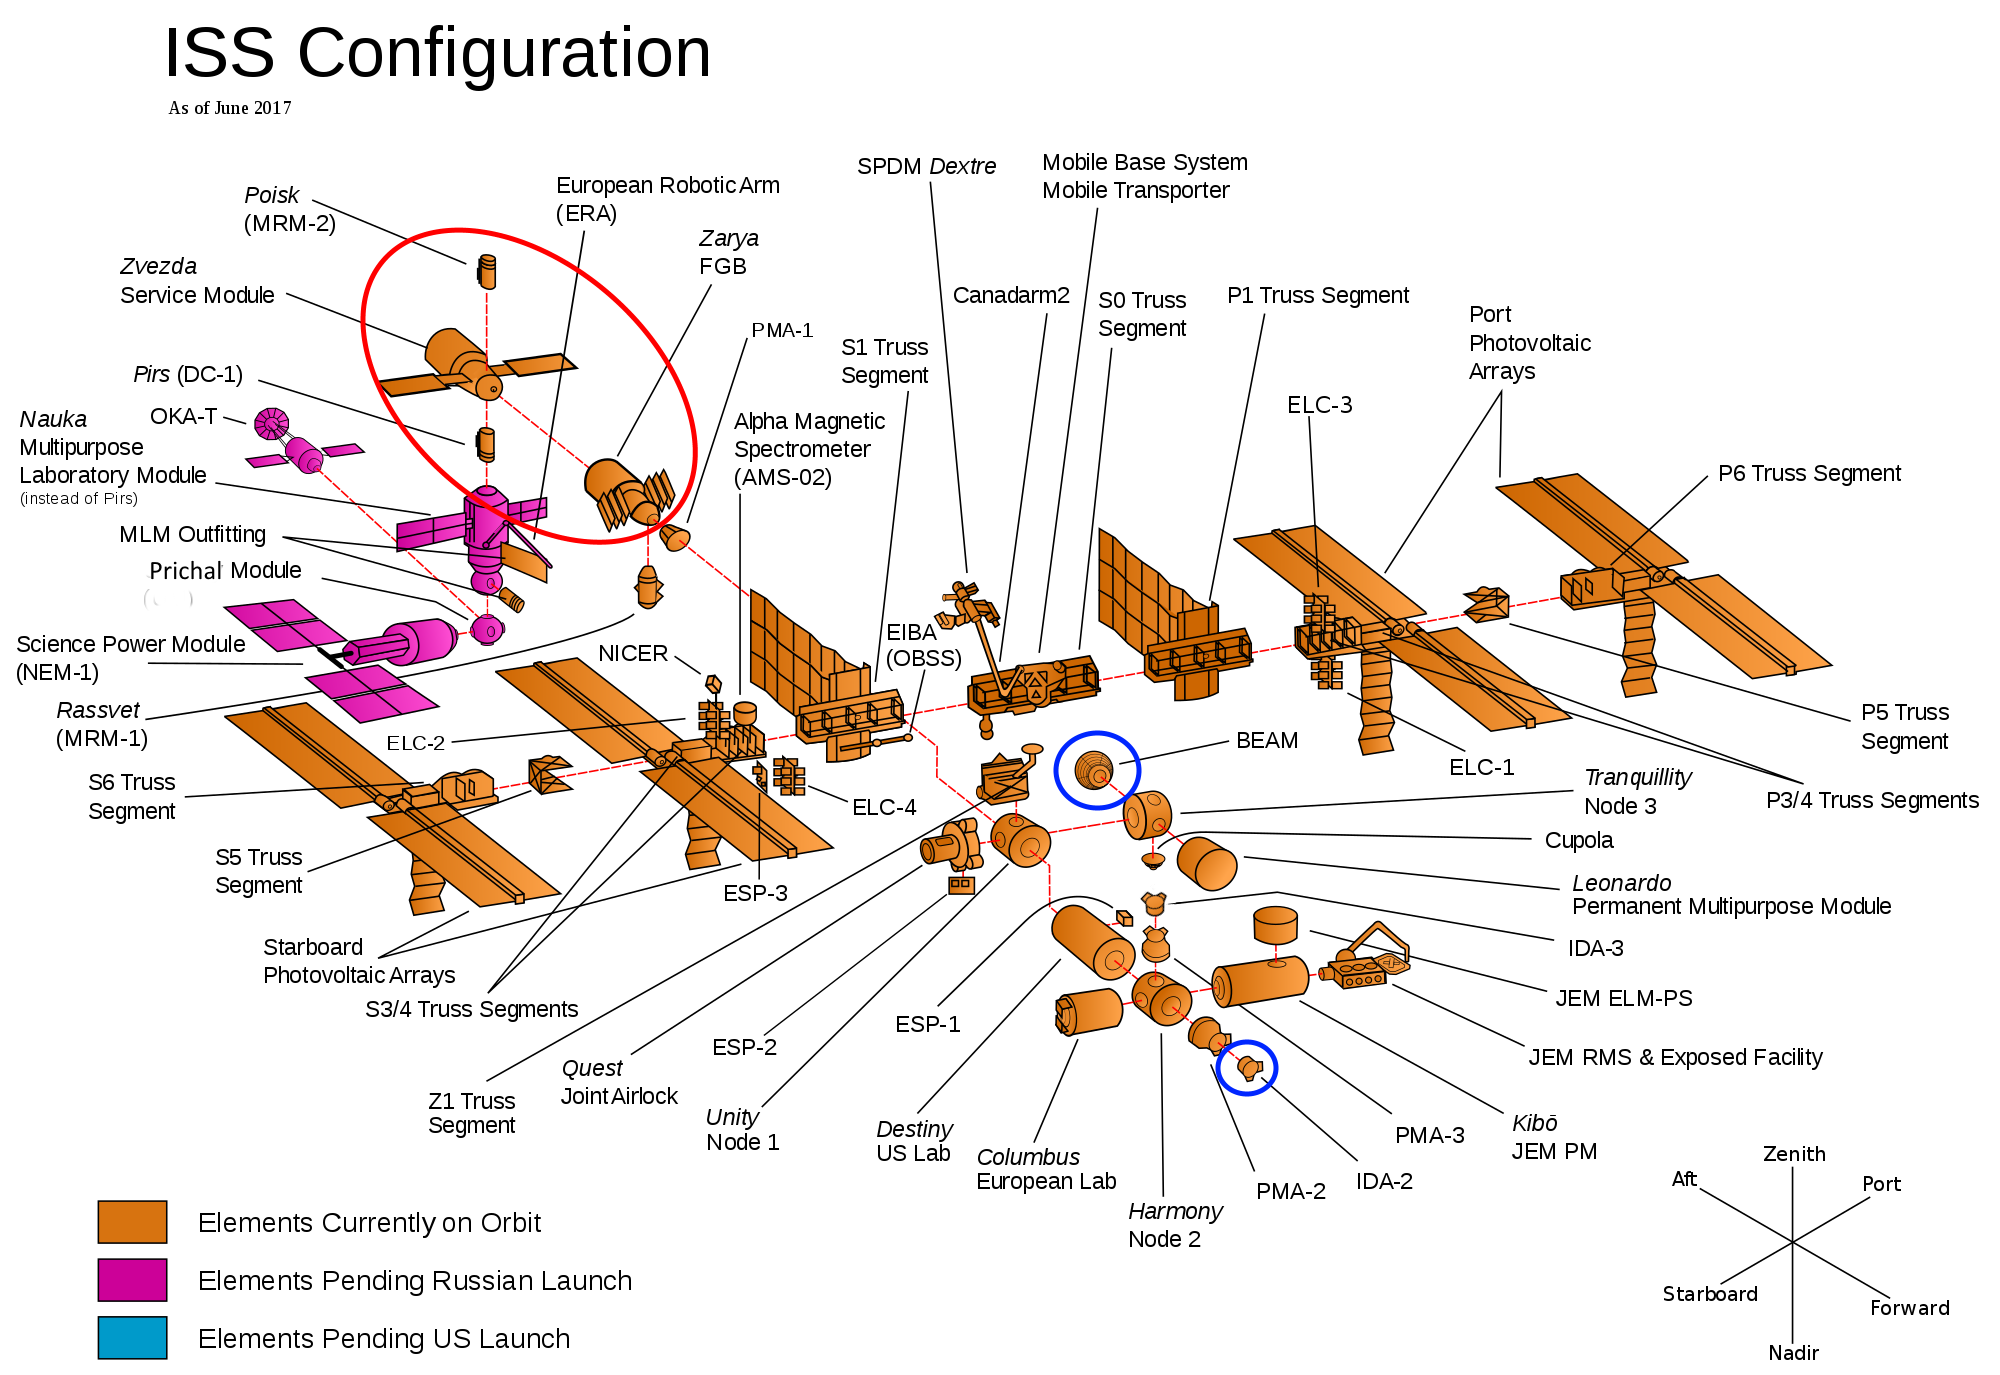 Статистика строительства, снабжения и посещения МКС - 1